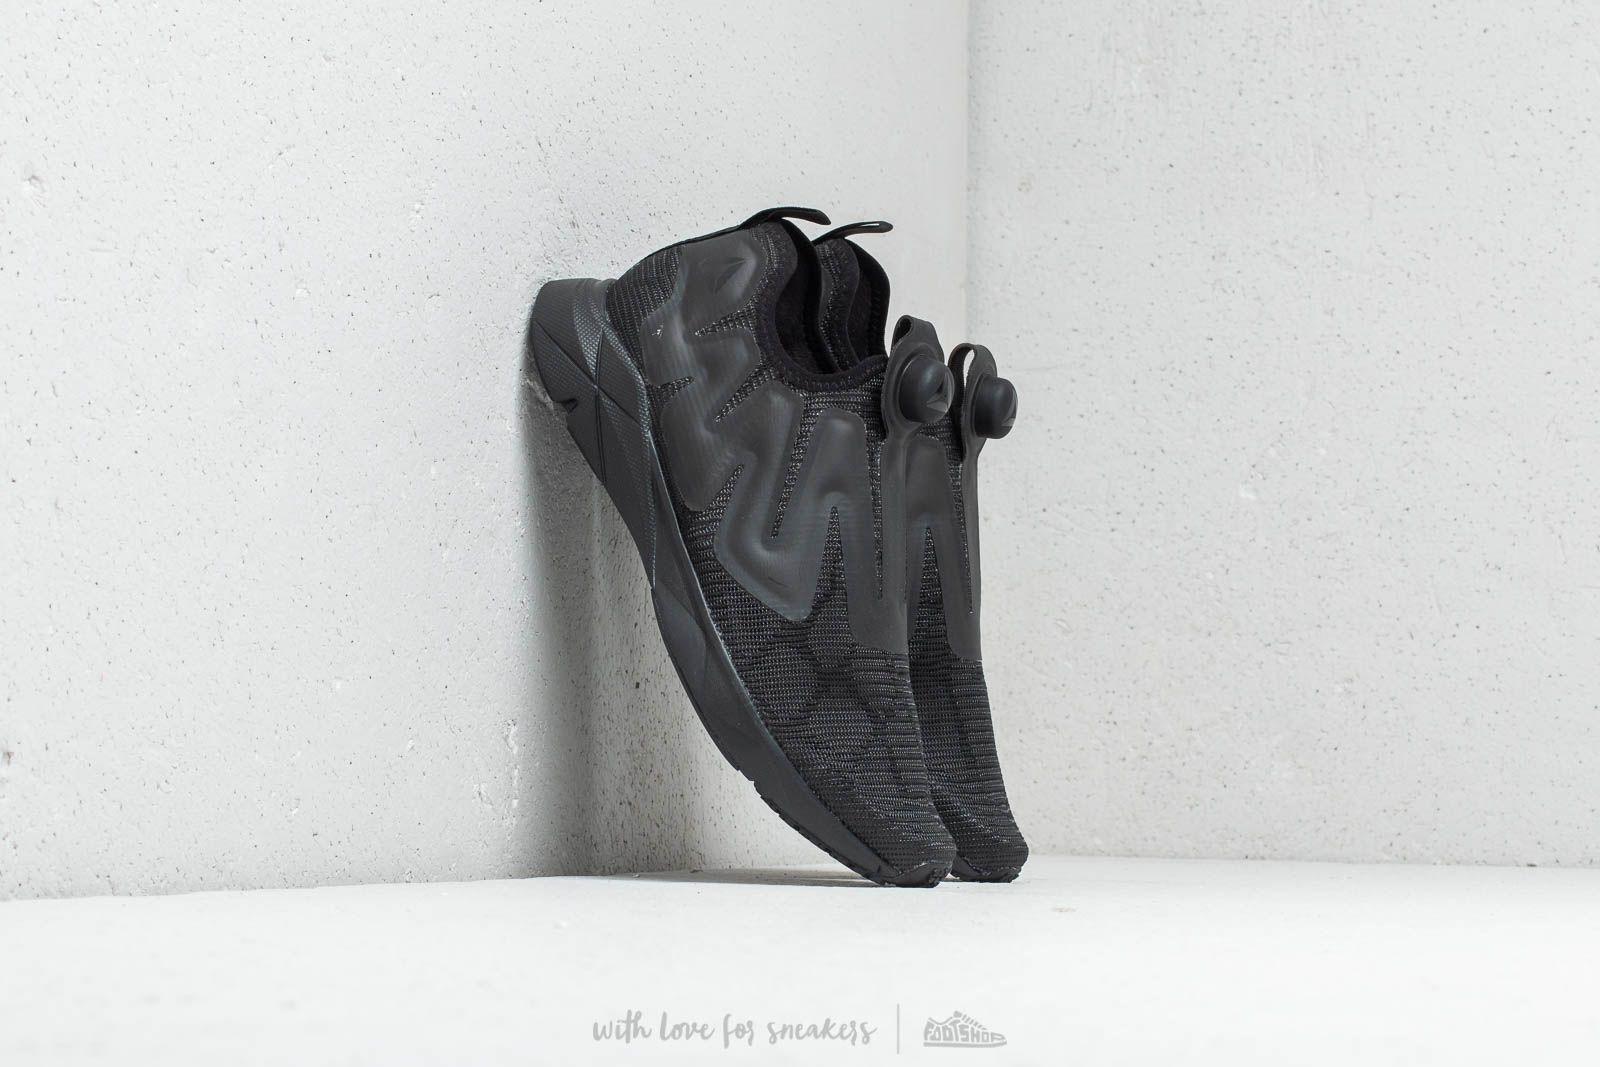 Pánské tenisky a boty Reebok Pump Supreme Flexweave Black/ Ash Grey